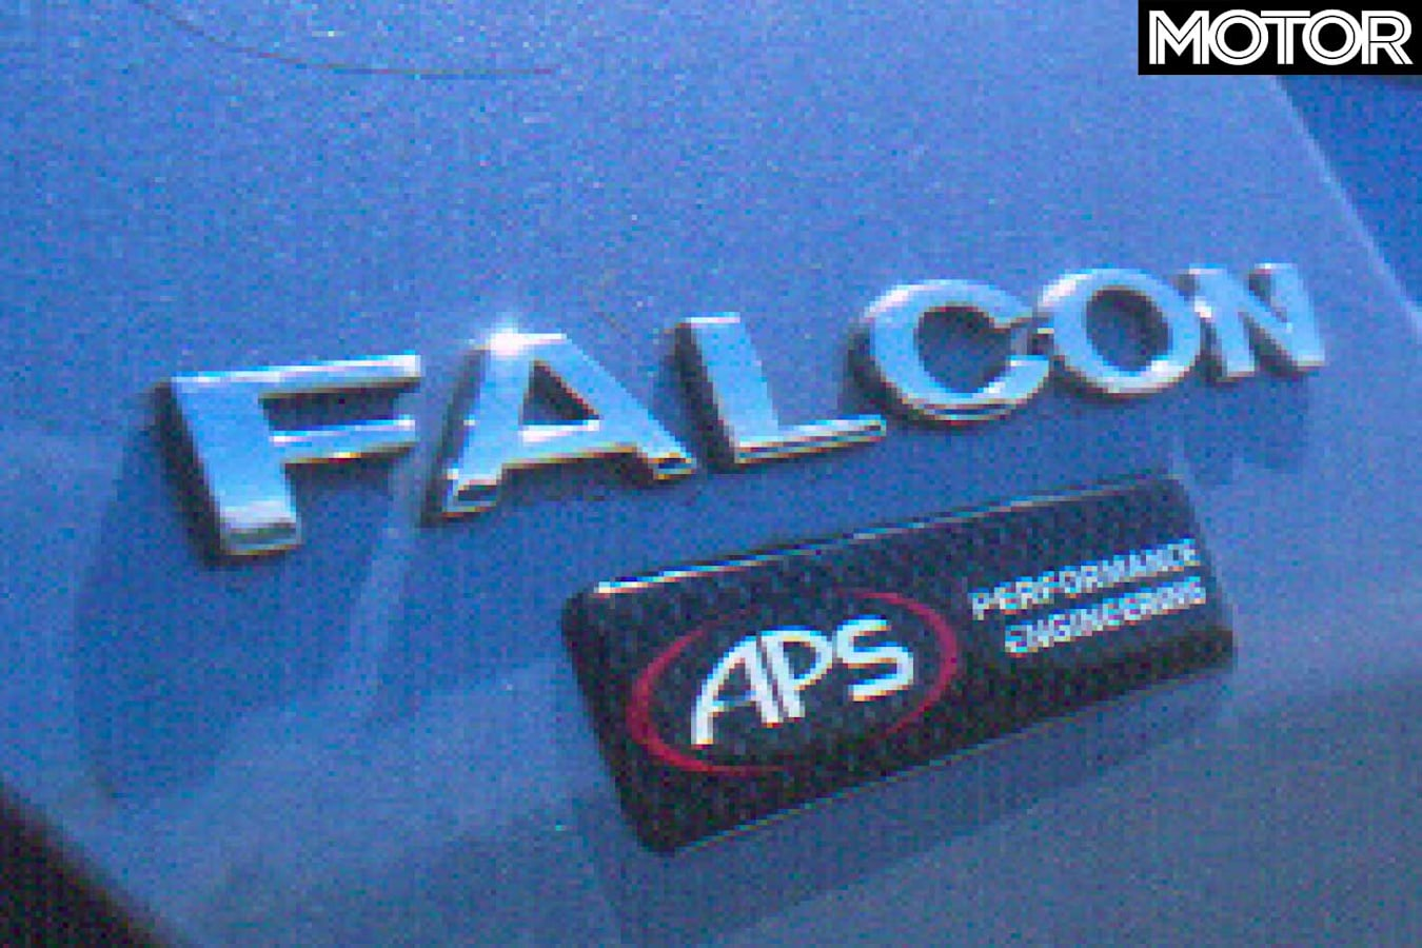 2004 APS Falcon Phase III XR 6 T Badge Jpg